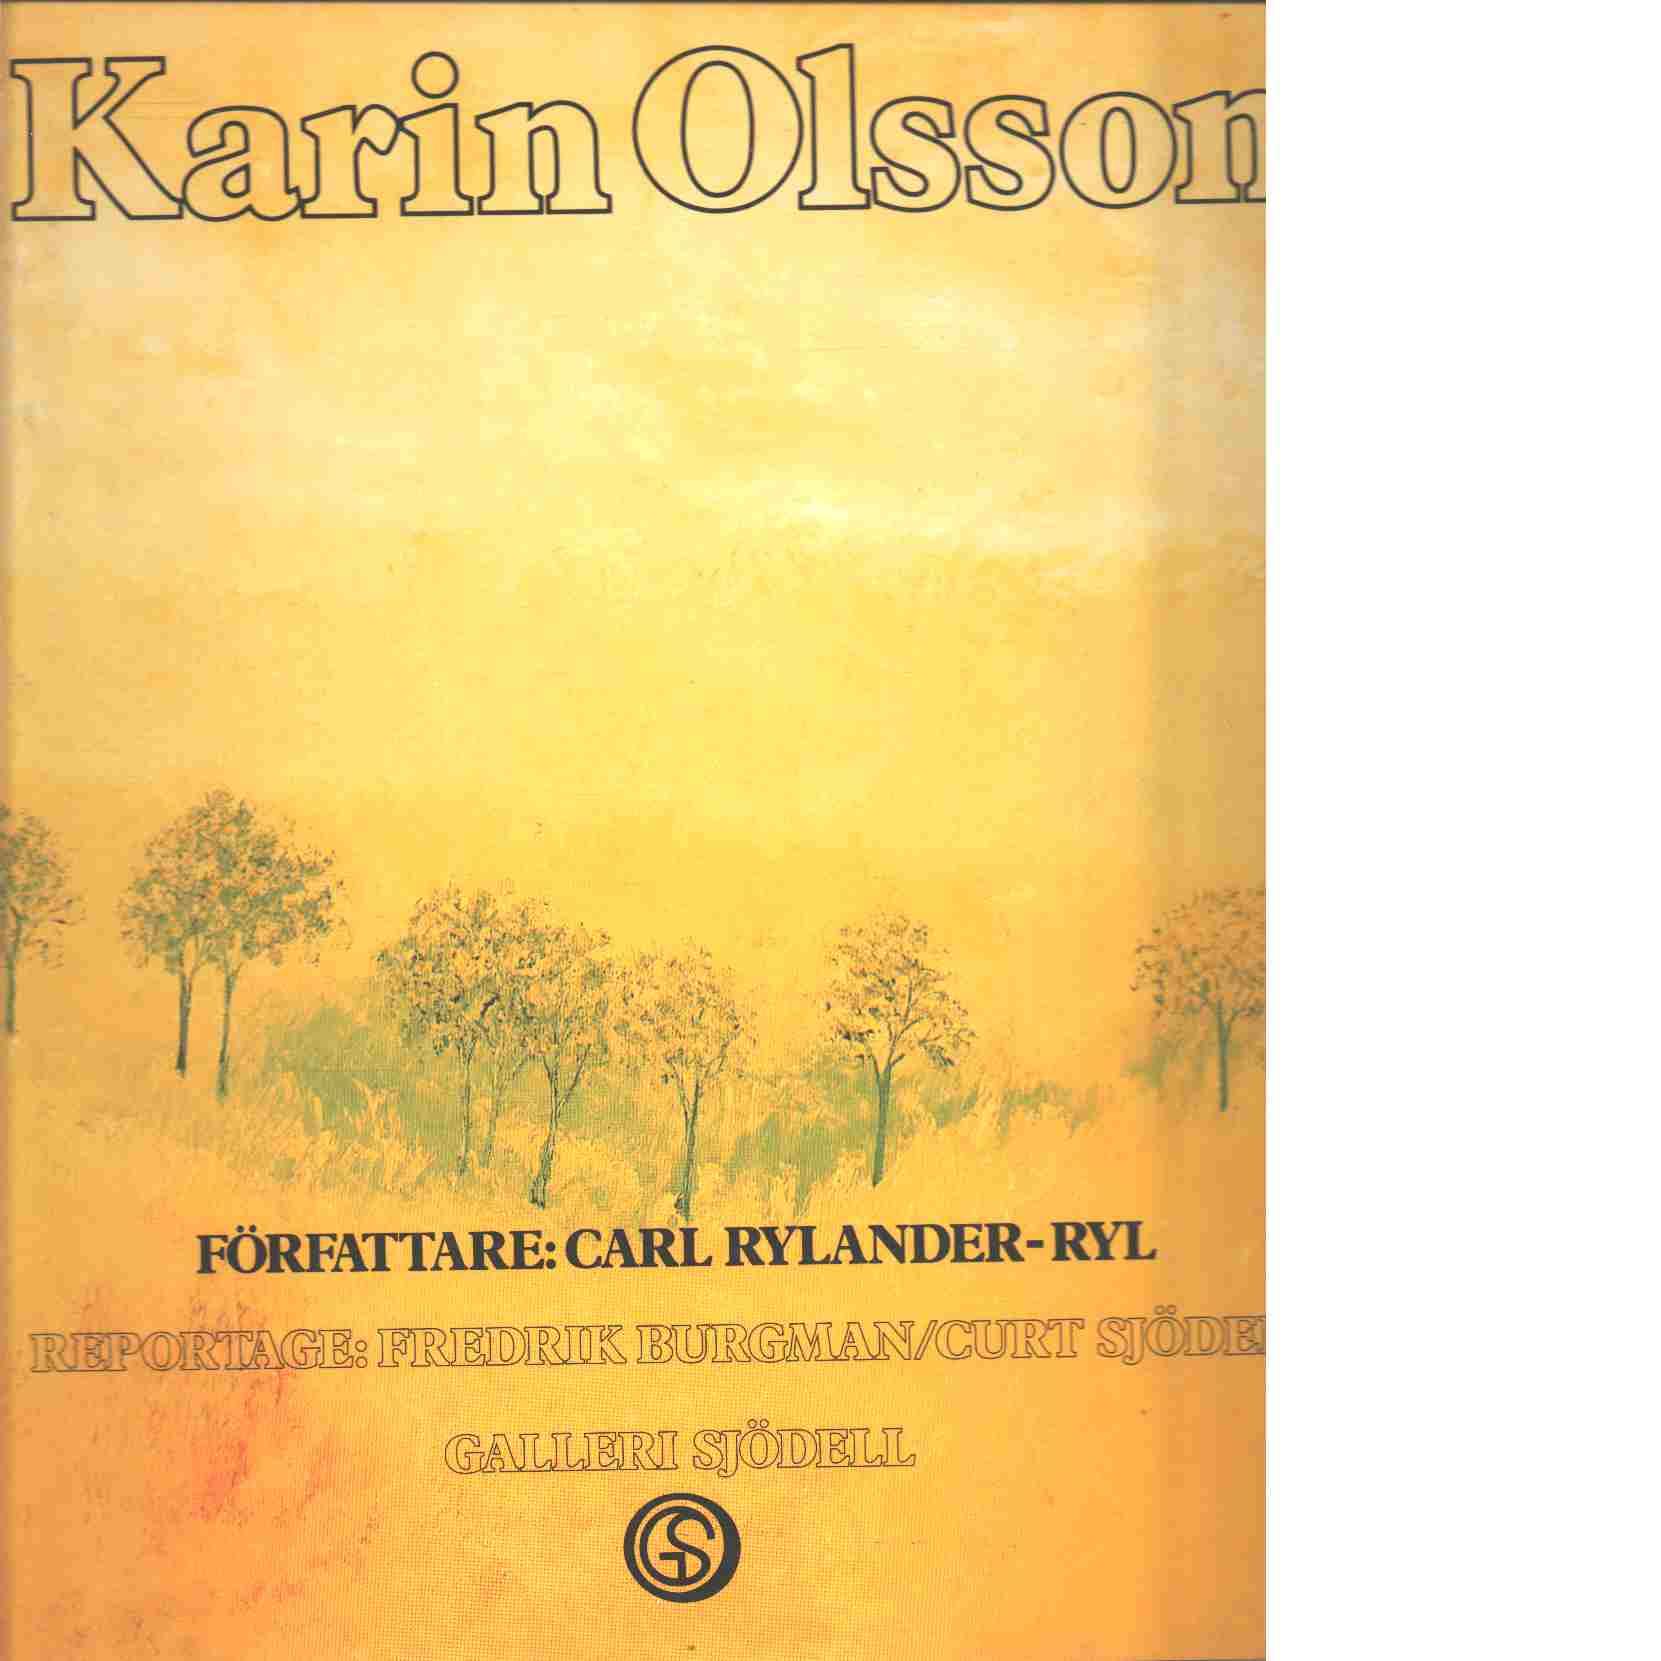 Karin Olsson - Rylander-Ryl, Carl